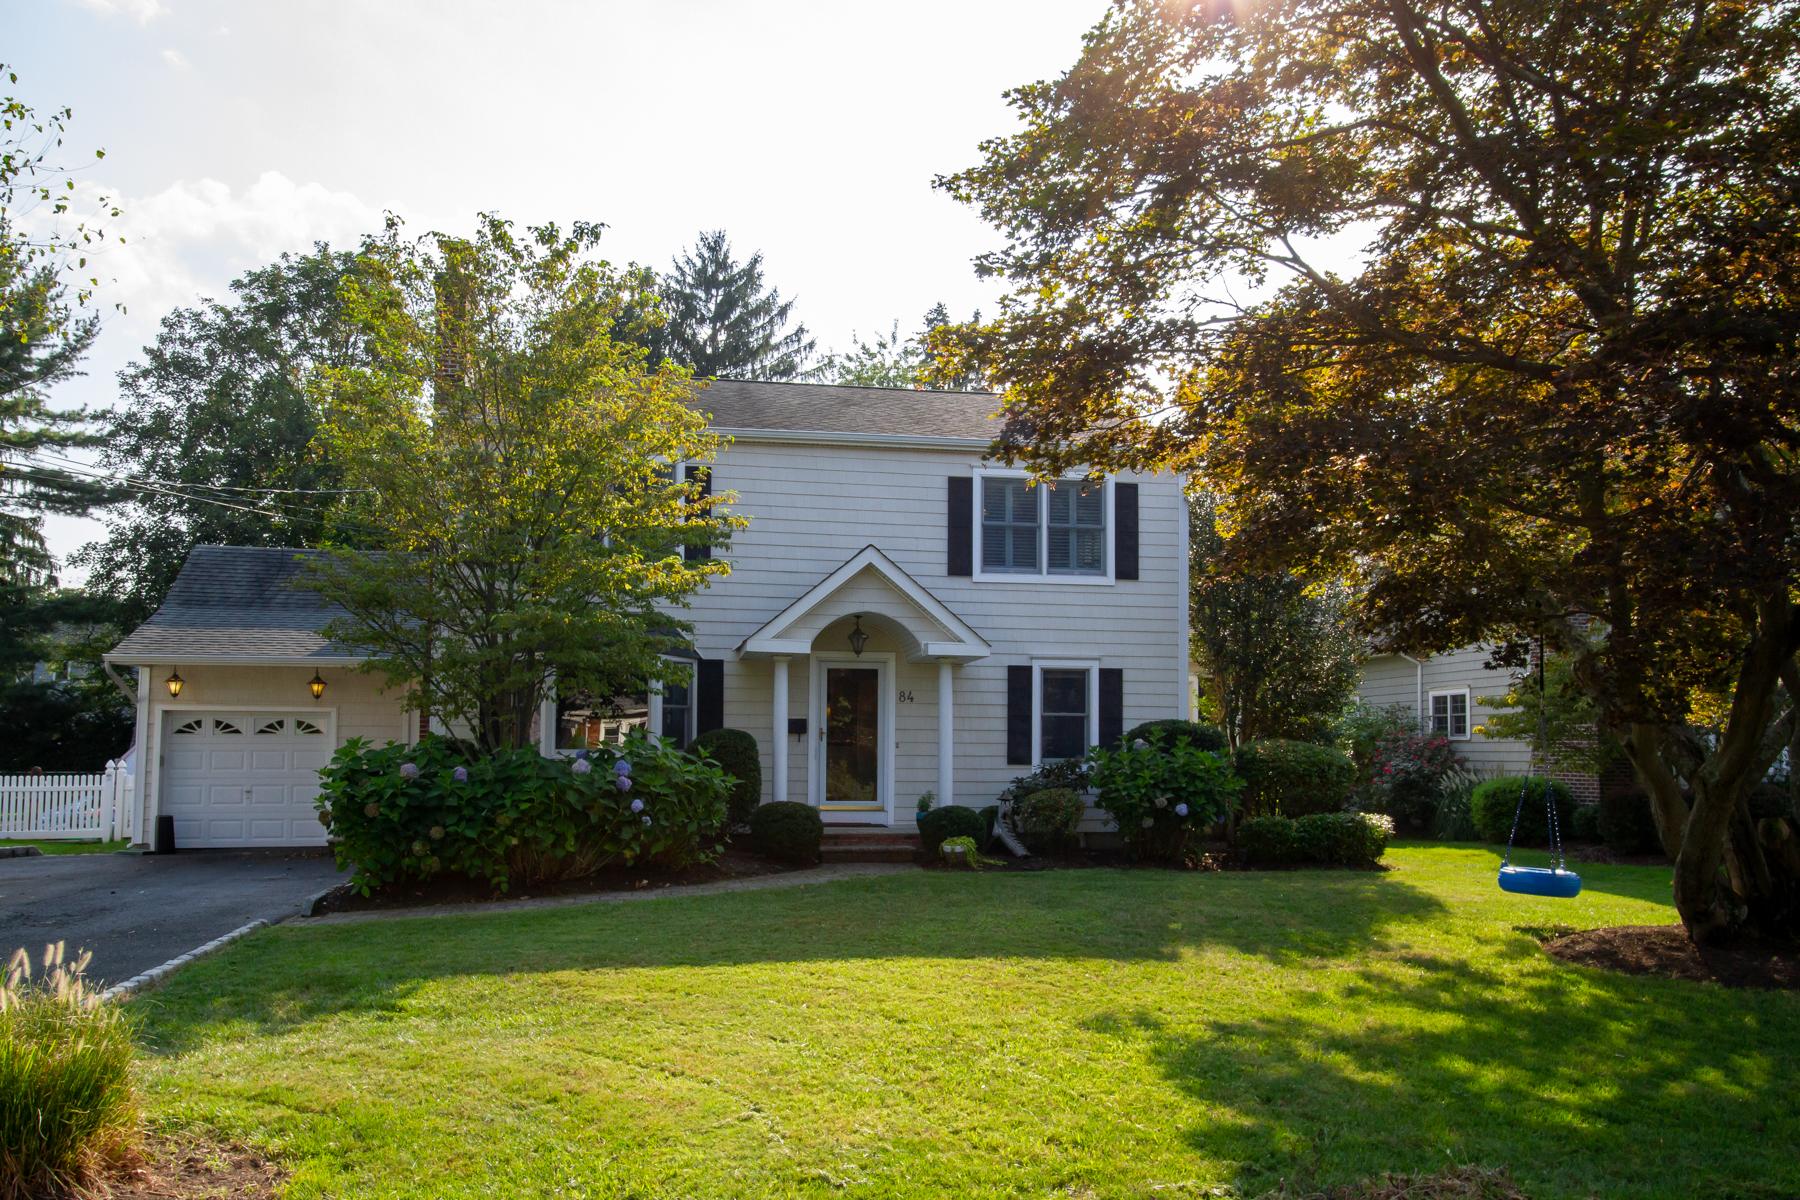 Single Family Homes pour l Vente à We love Lovett! 84 Lovett ave, Little Silver, New Jersey 07739 États-Unis